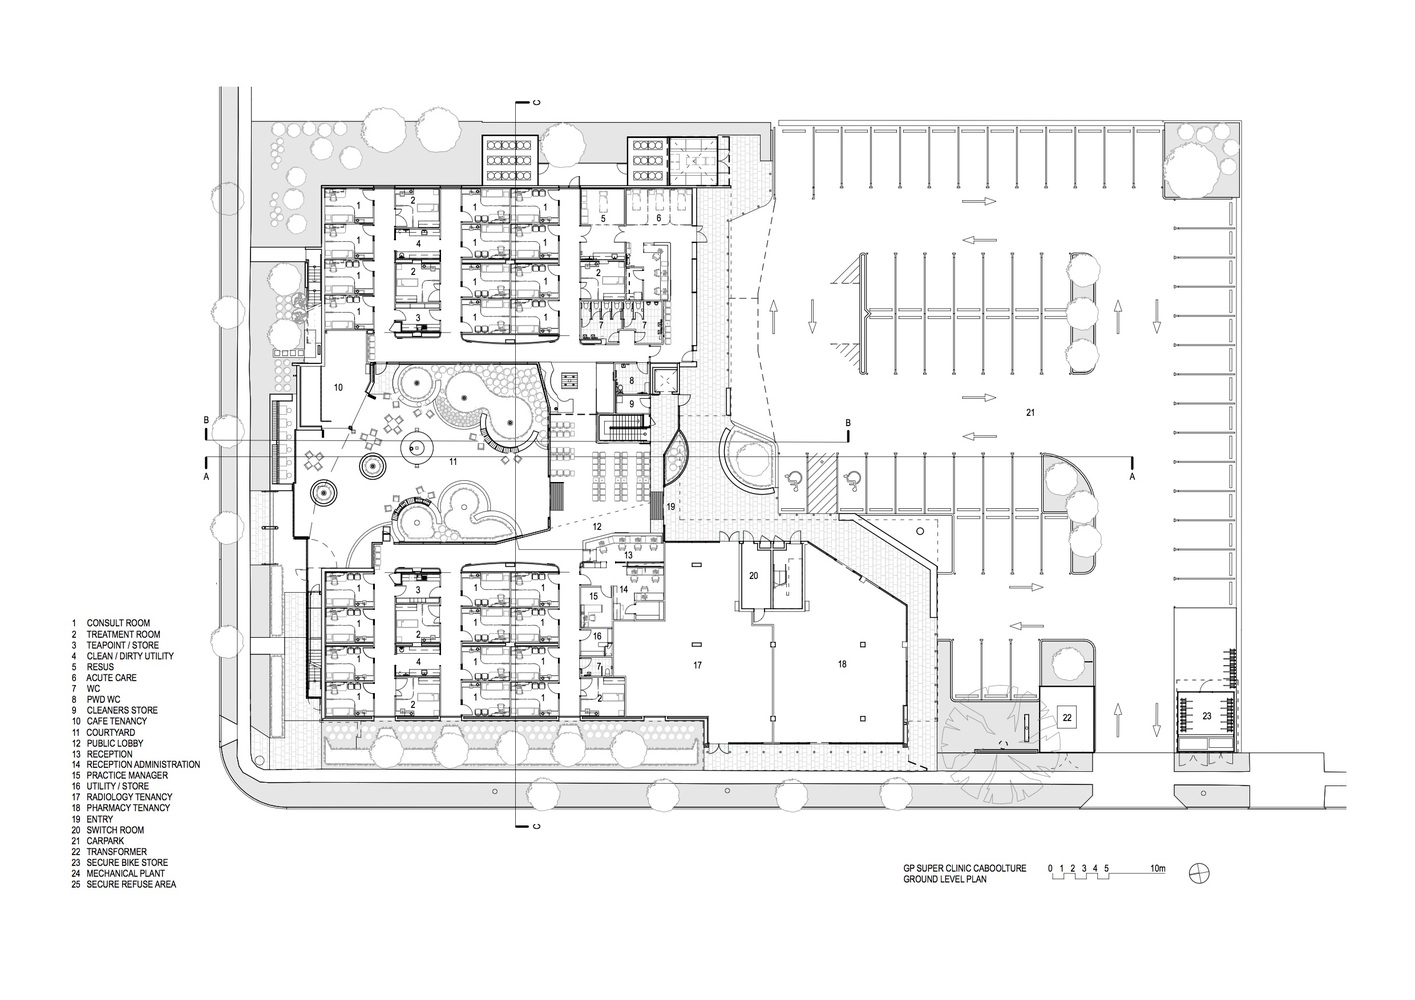 medium resolution of caboolture gp super clinic ground floor plan